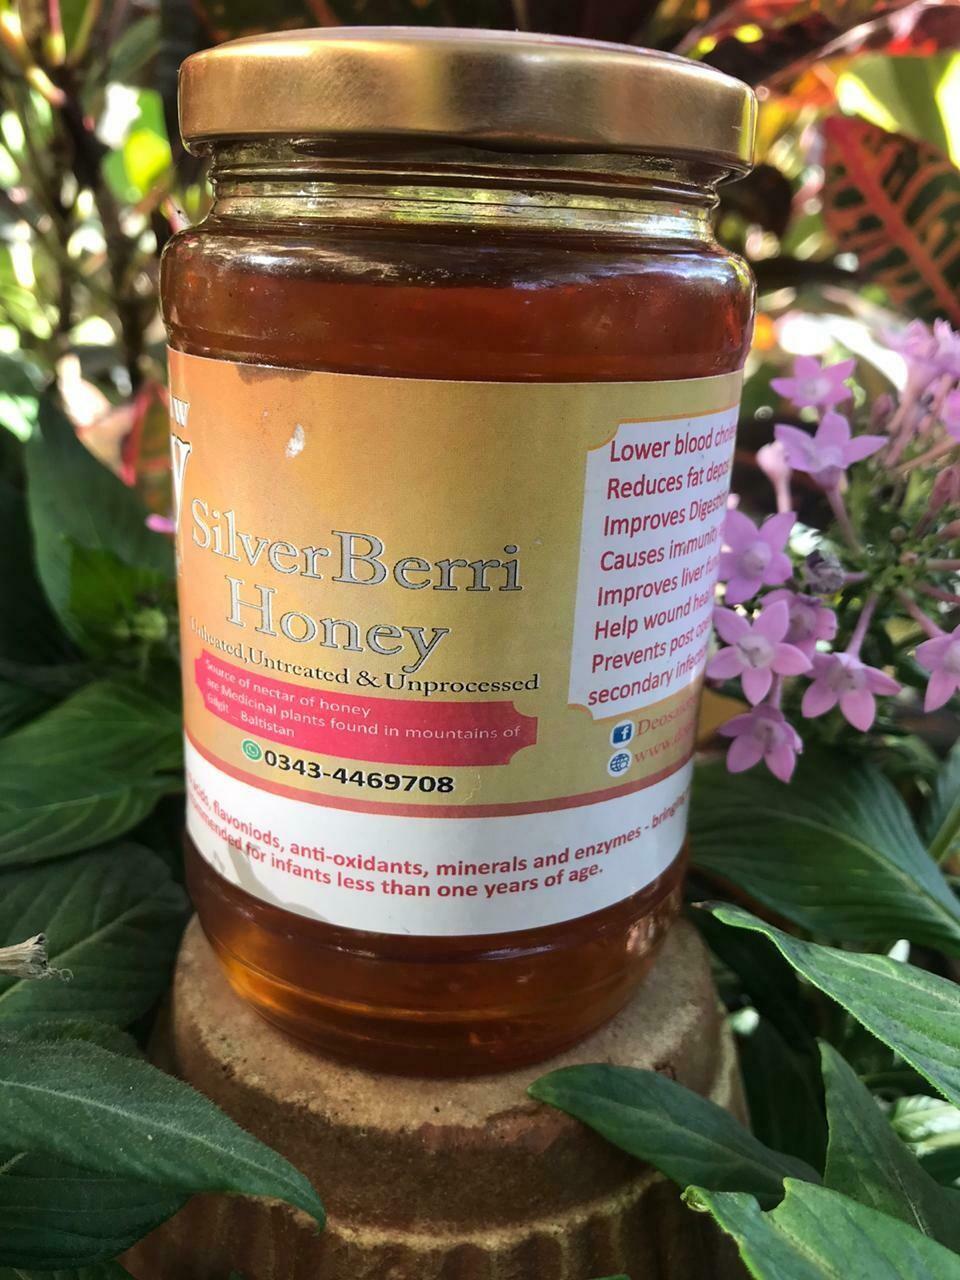 Silver Beri Honey - 450g